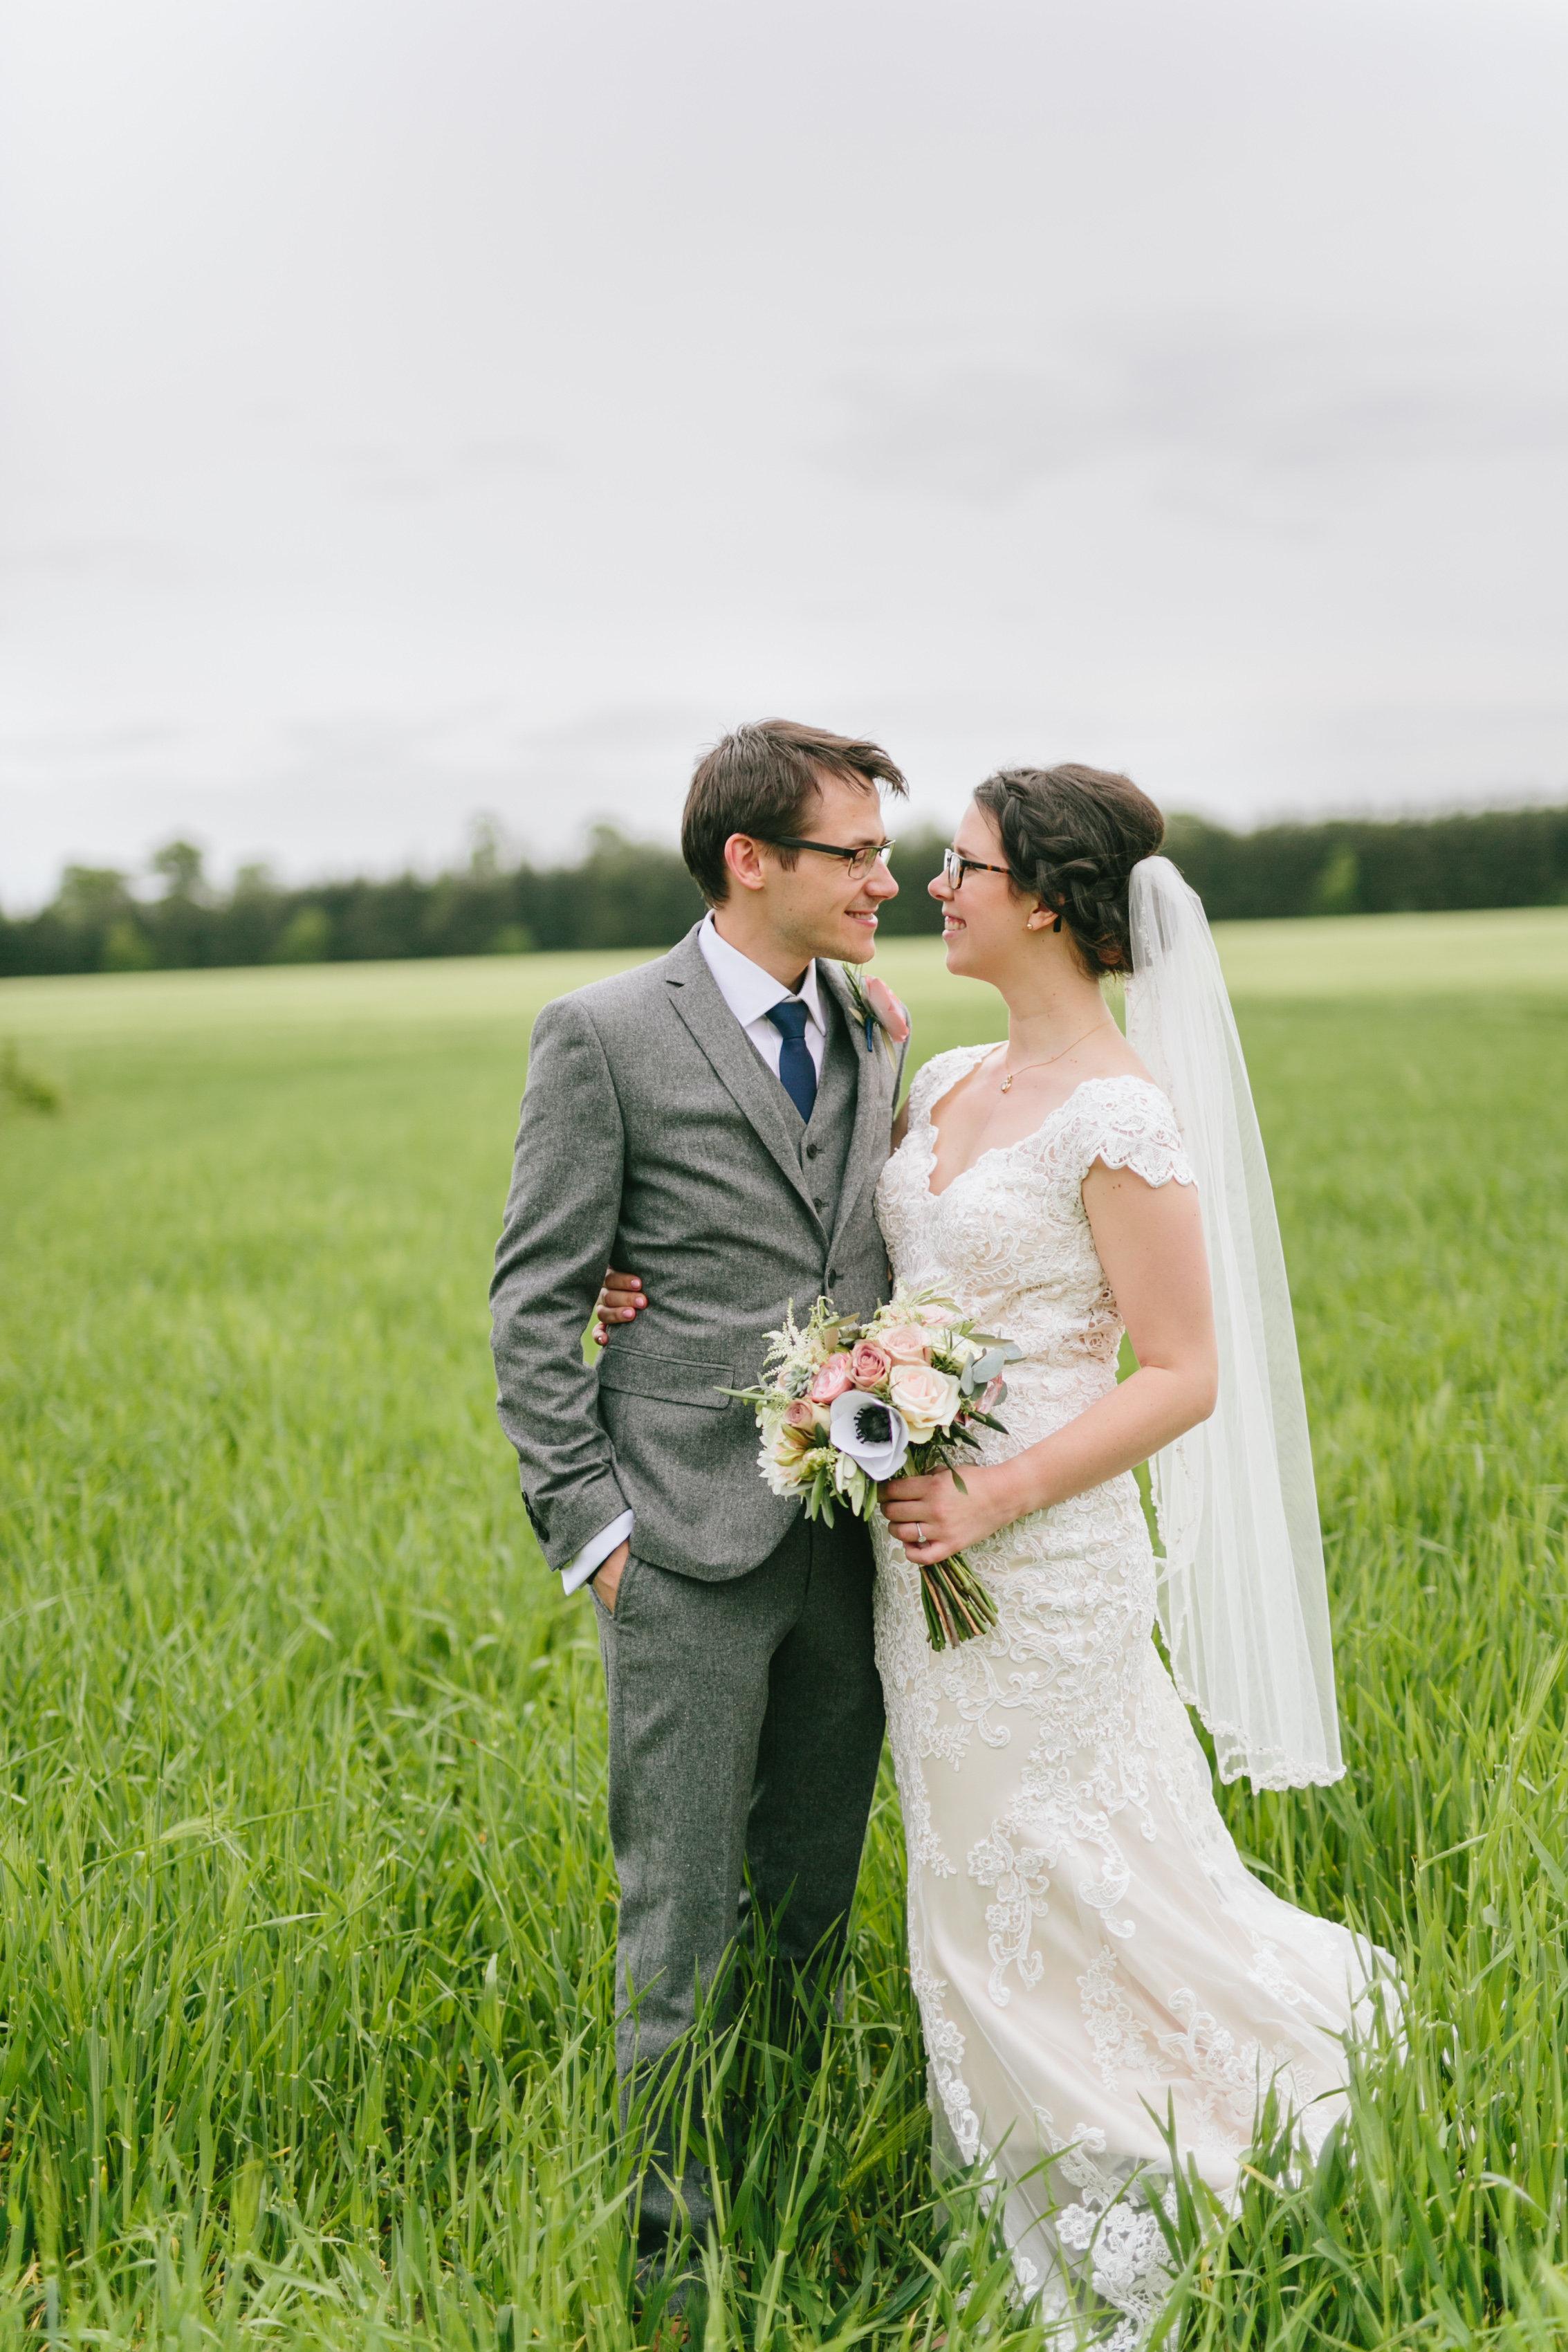 Choosing Wedding Vendors